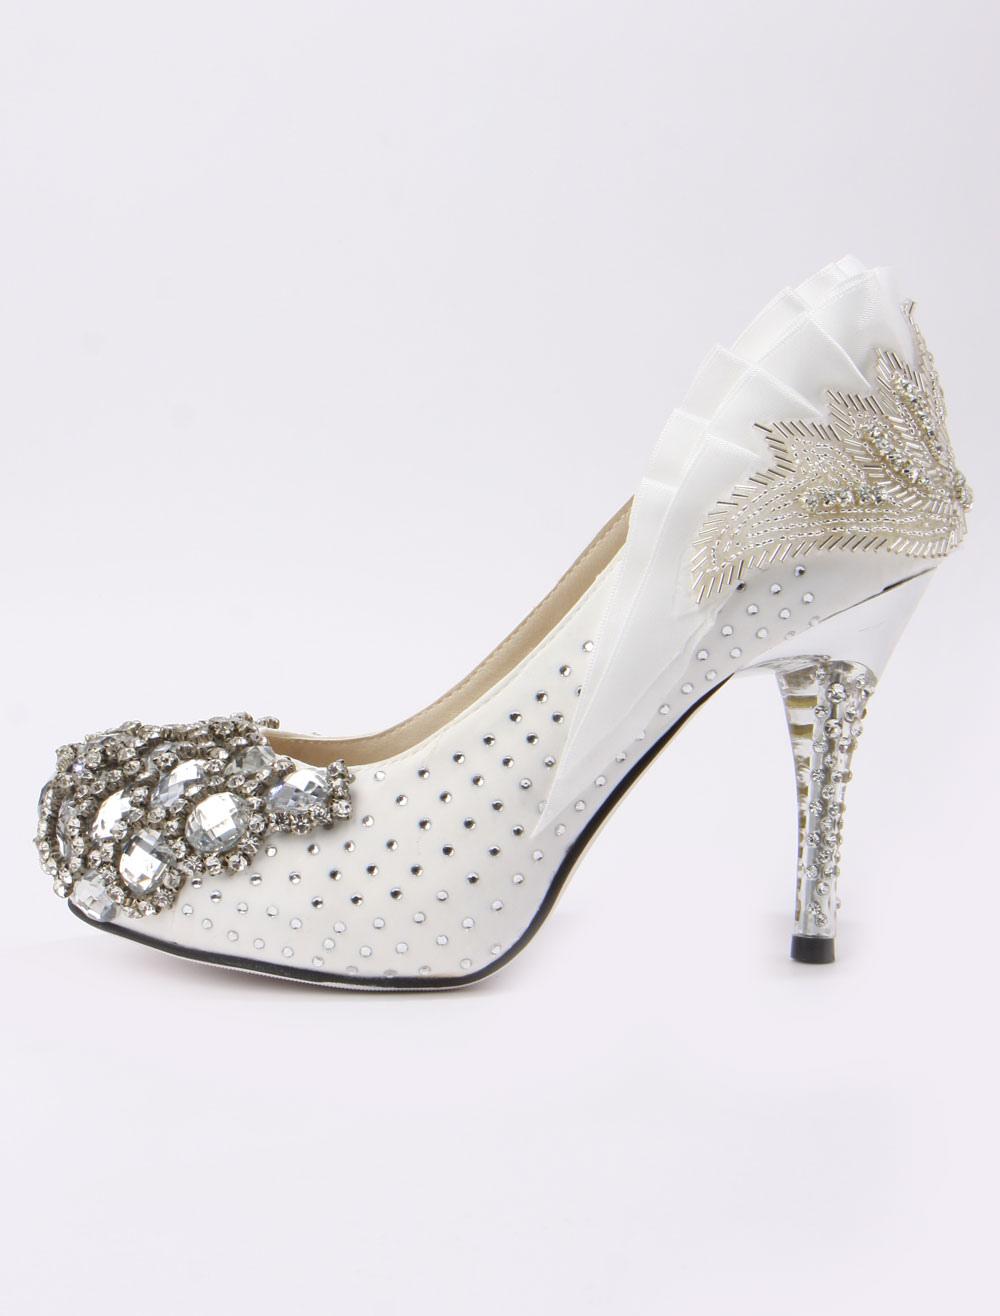 retro ruffles beading spike heel silk and satin cute bridal shoes no3